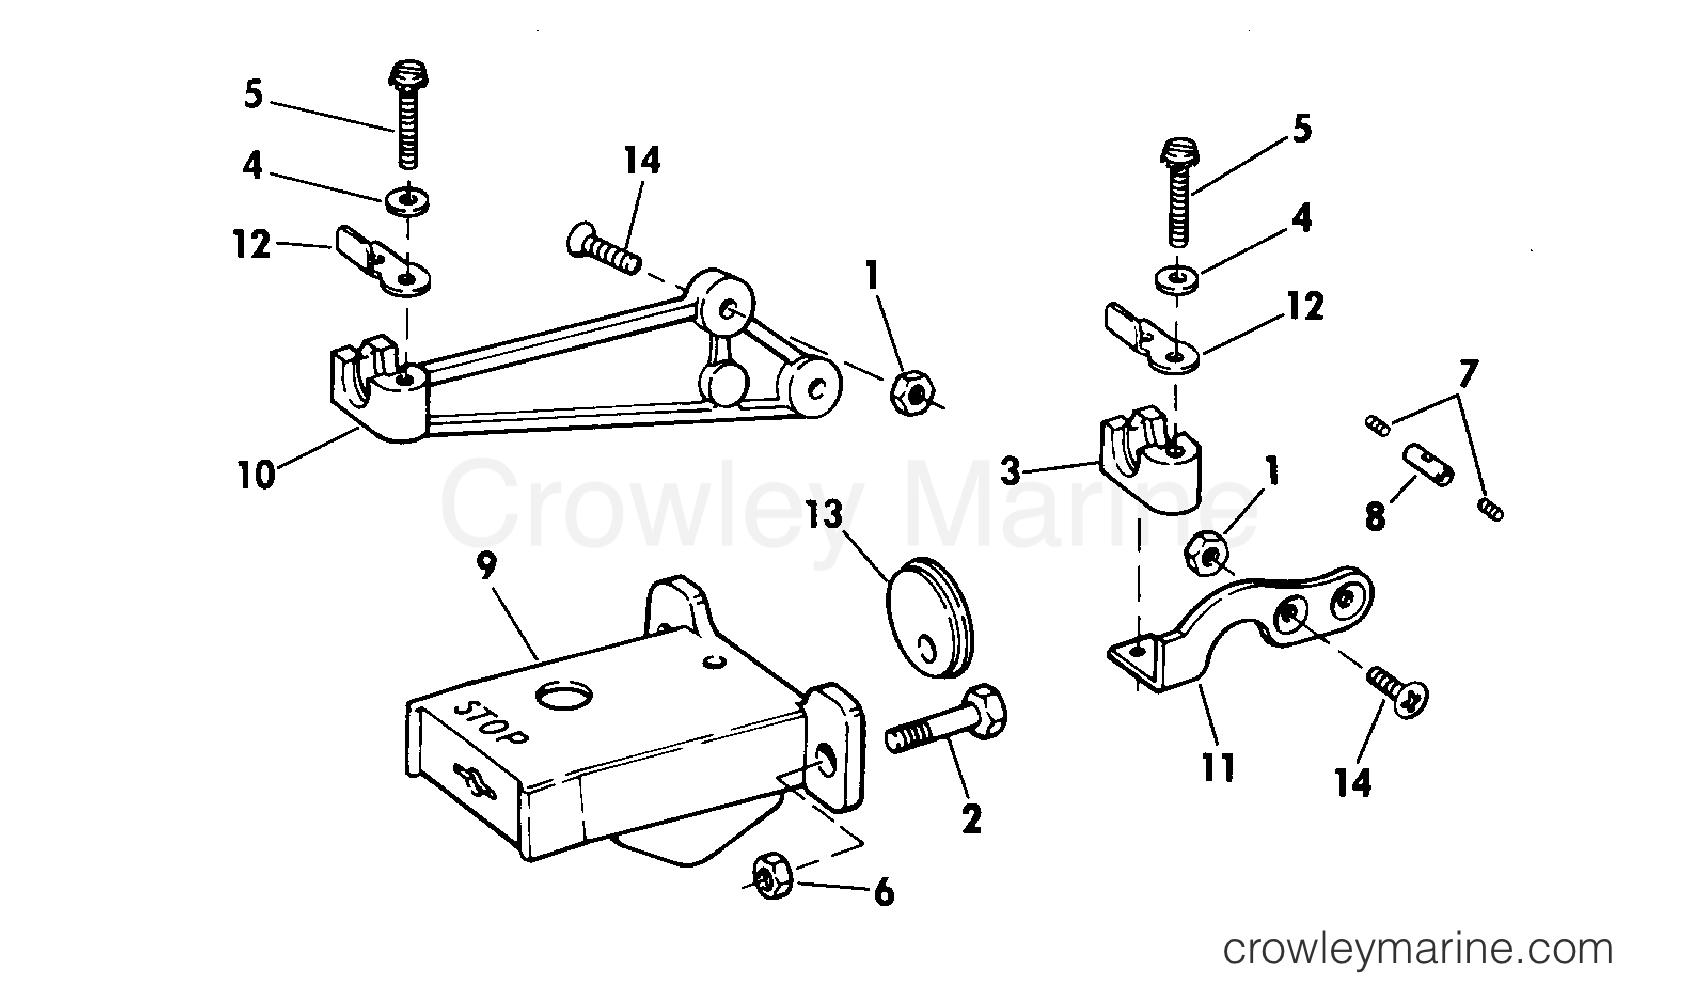 adapter kit-remote control 9 9  u0026 15 hp